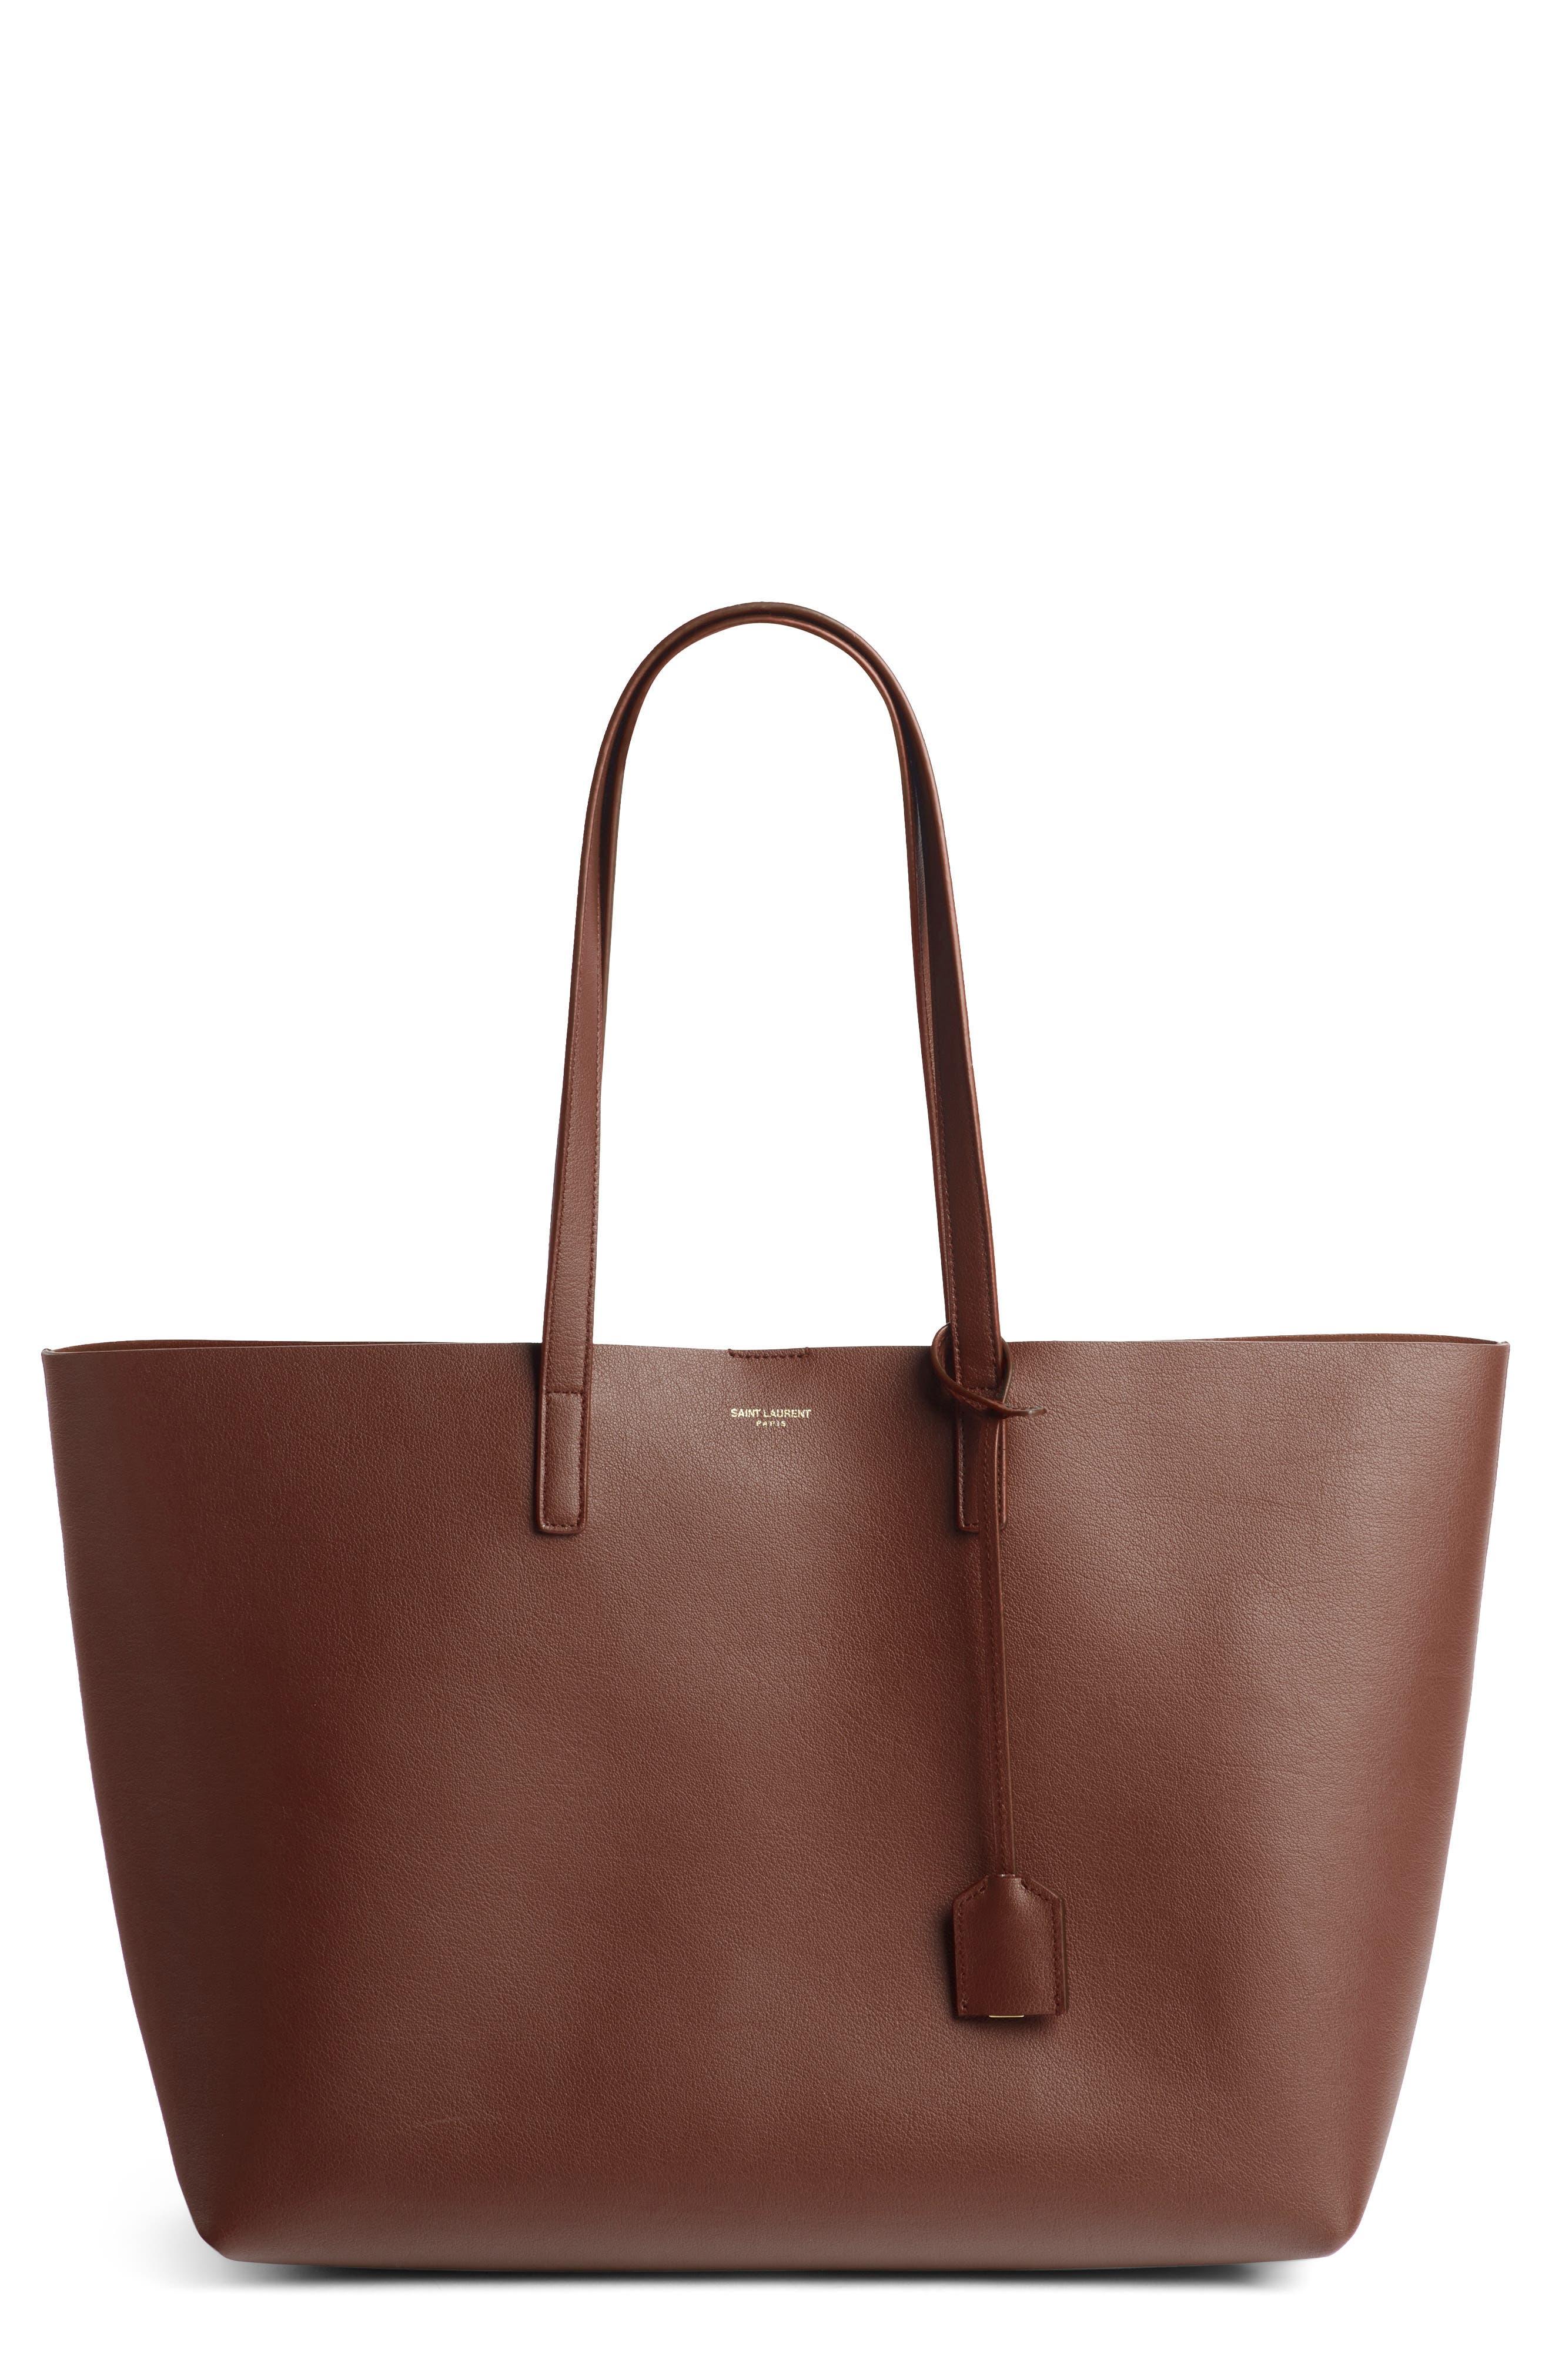 46c9b28f68 ysl handbags | Nordstrom